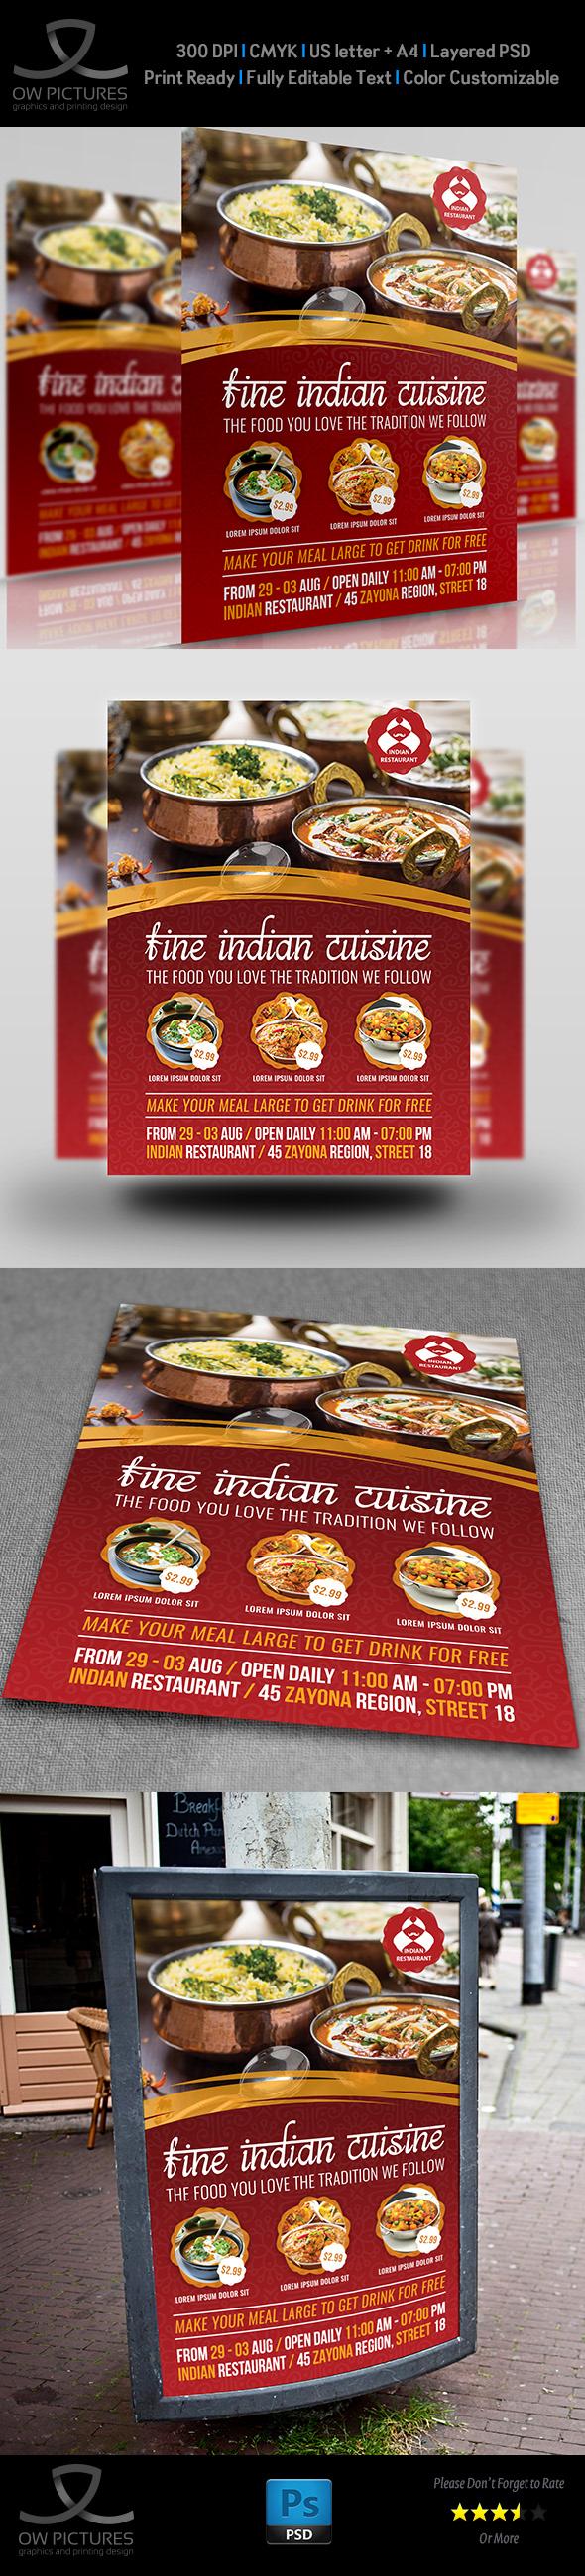 Indian Restaurant Flyer Template On Behance